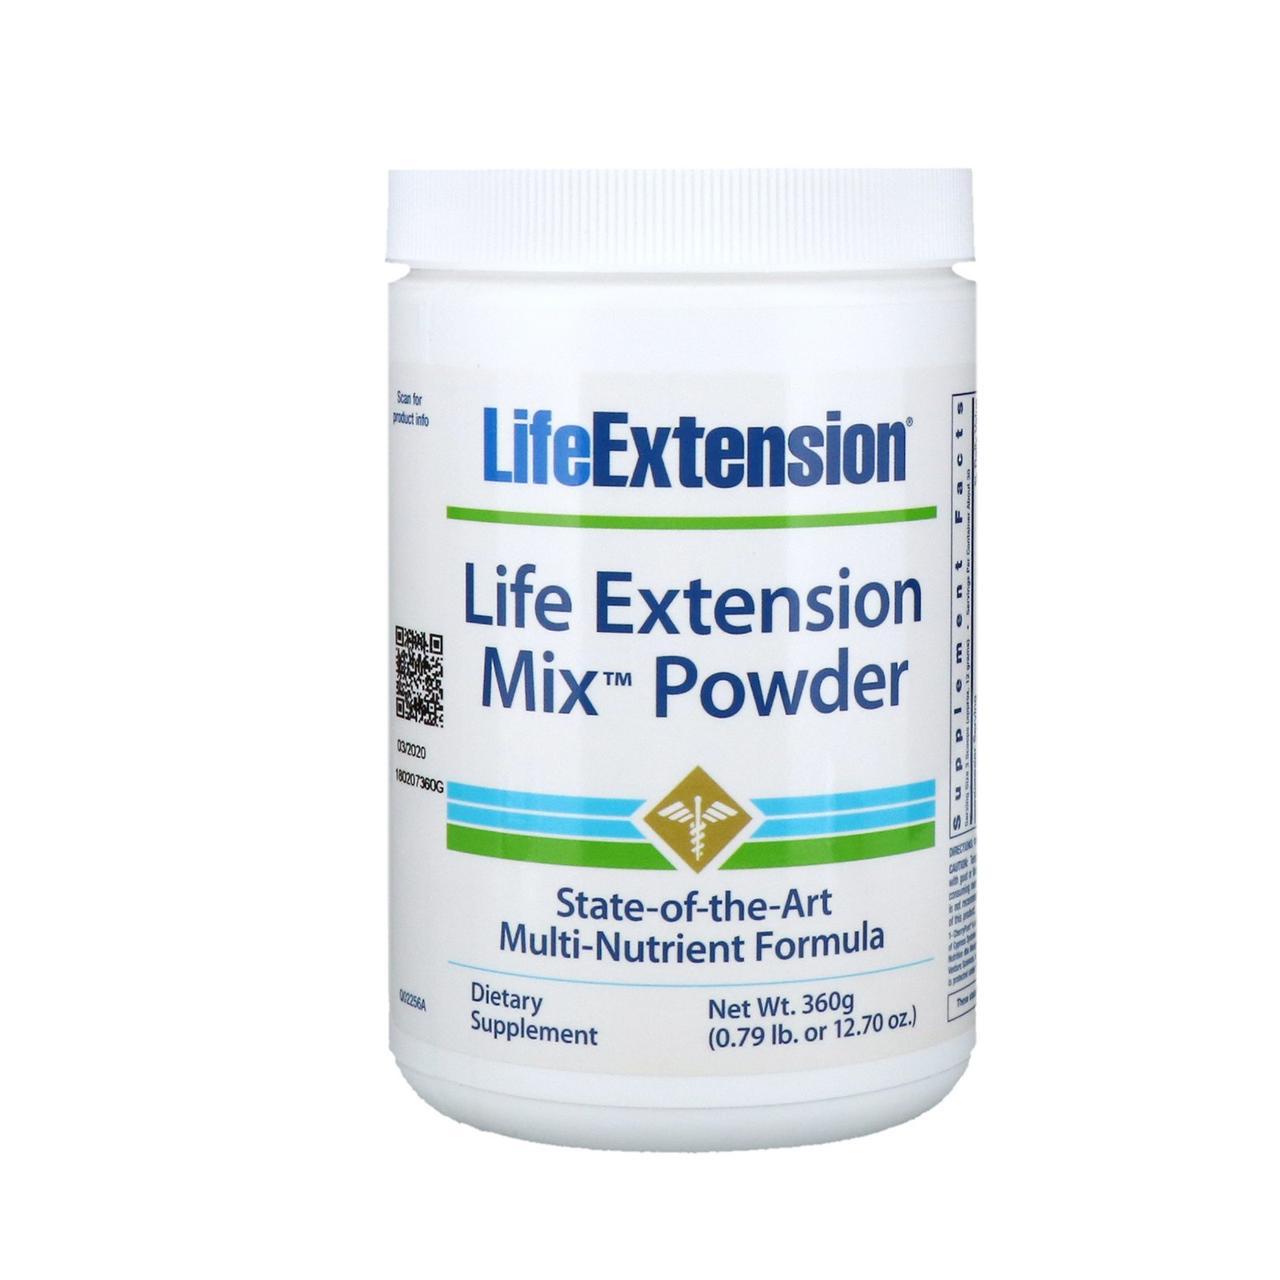 Life Extension, Порошок-микс, 12,70 унц. (360 г)